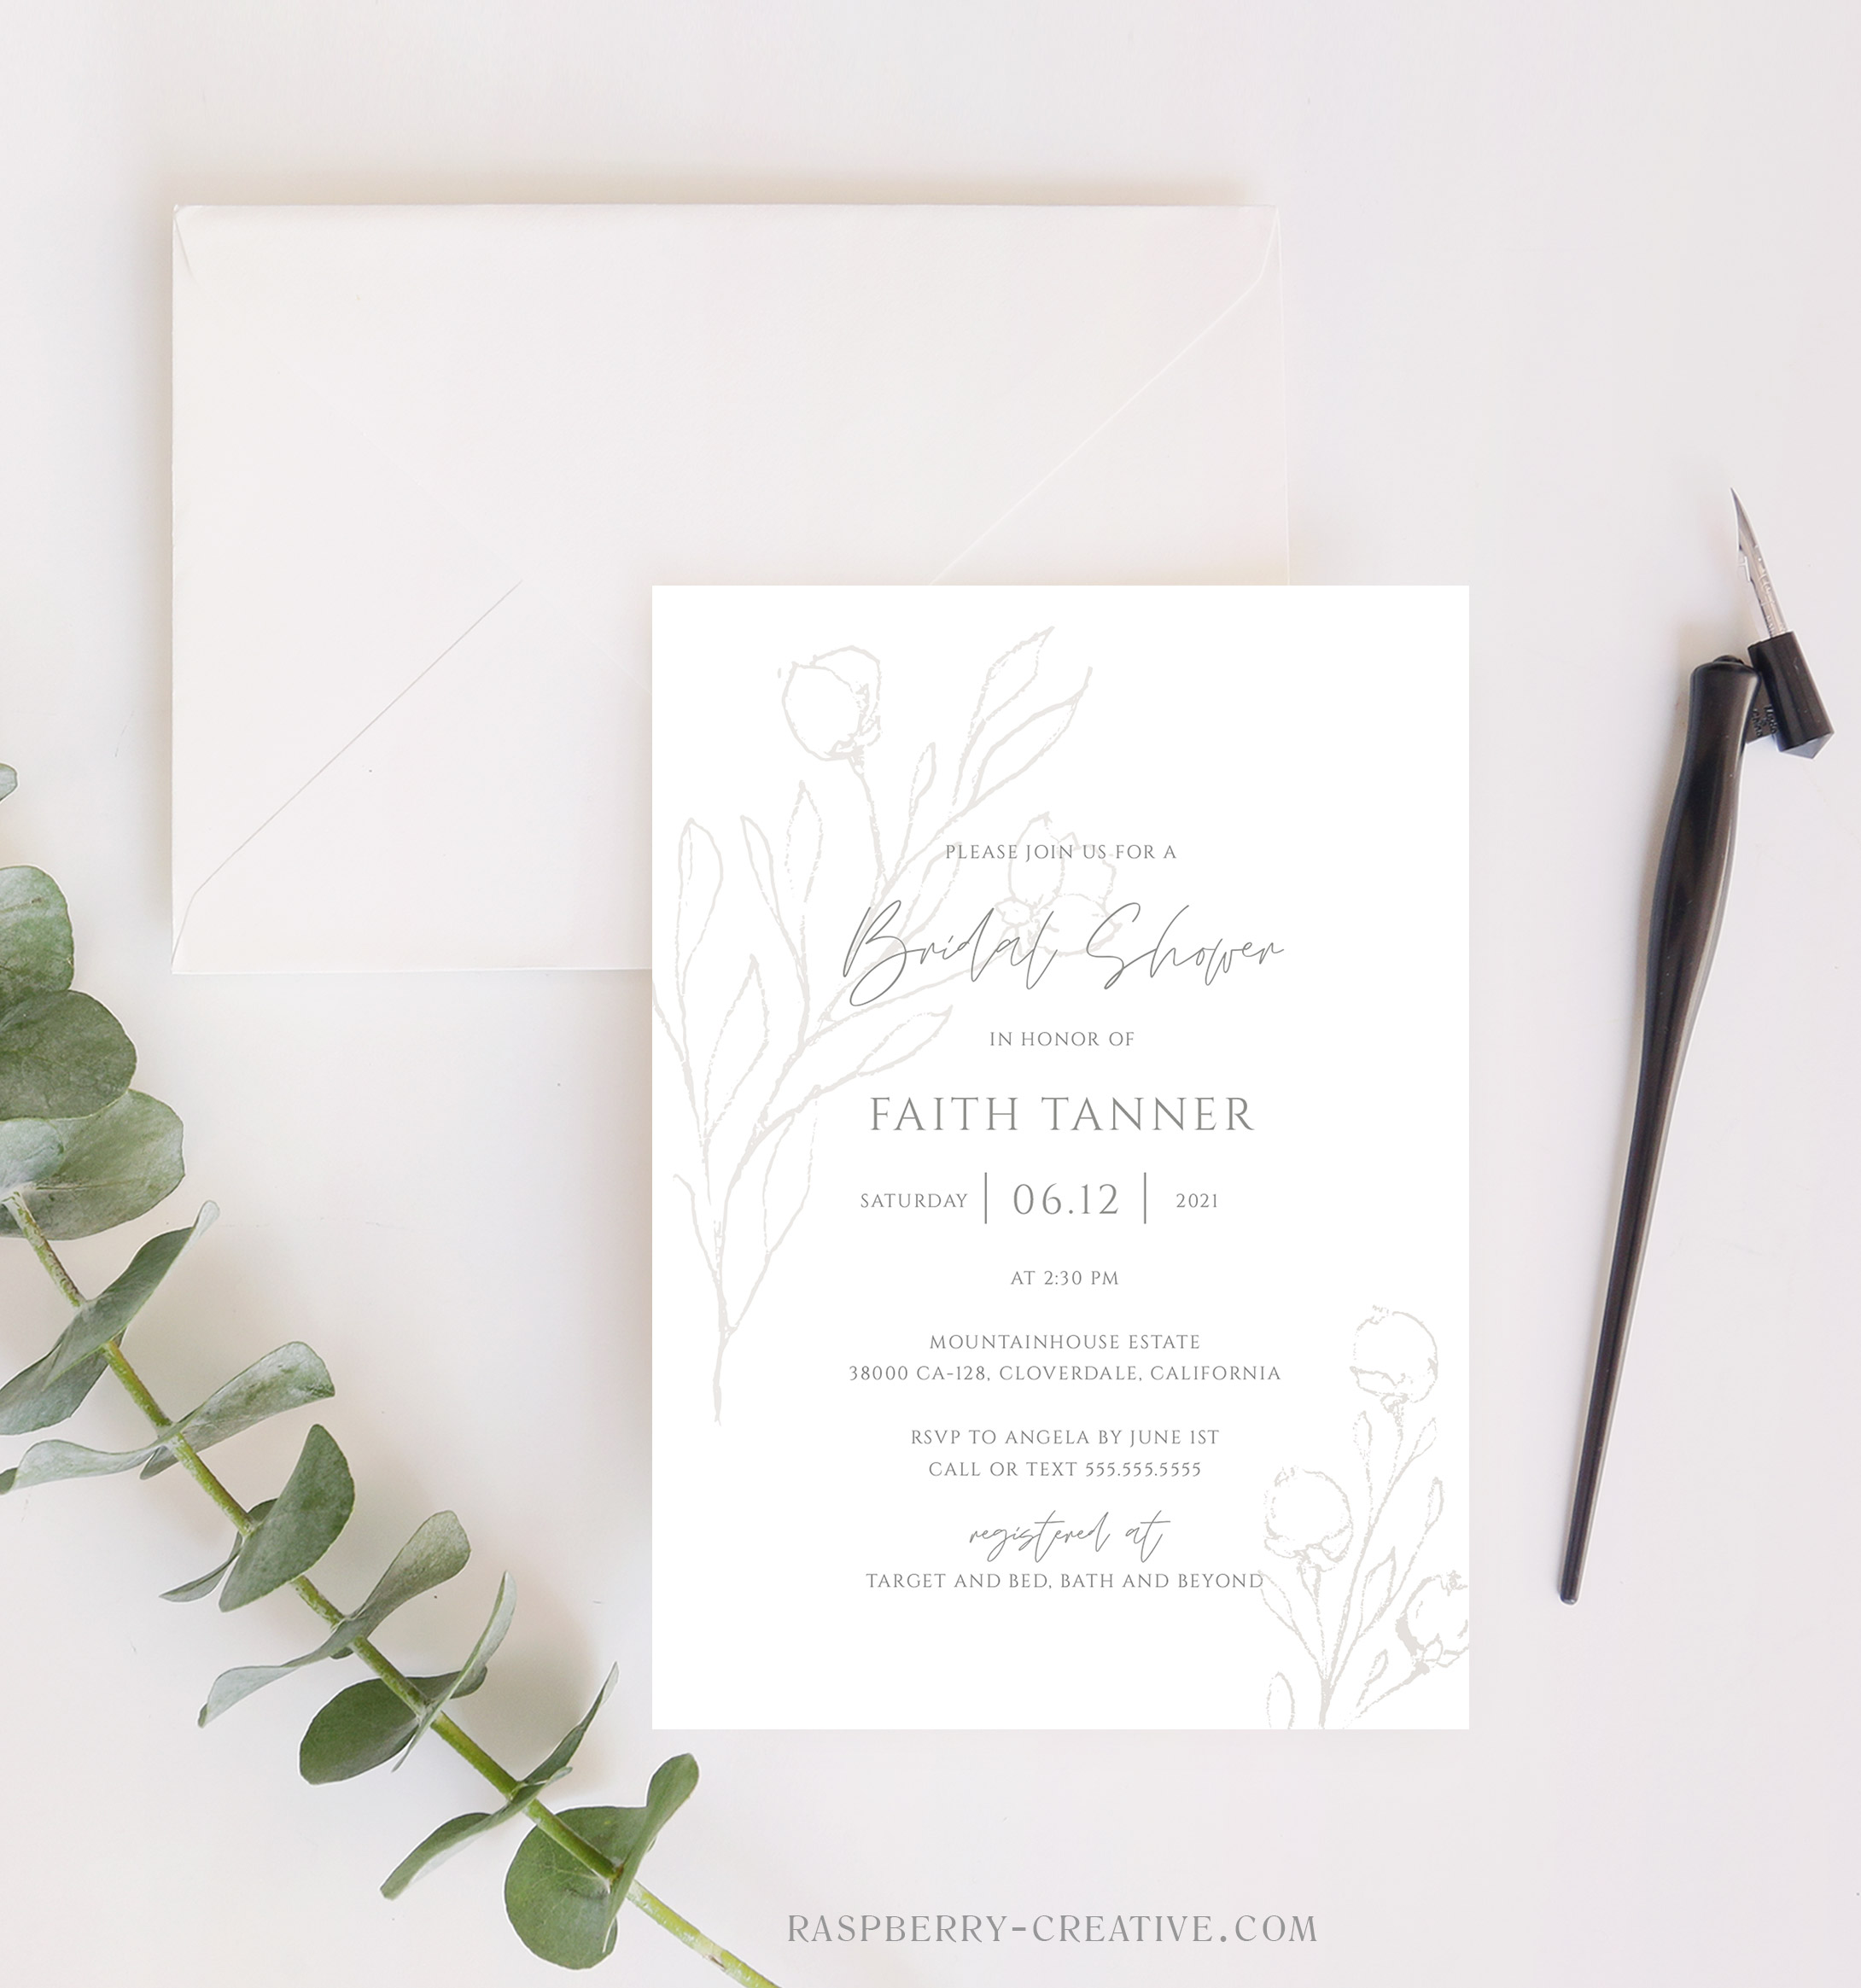 leeland elegant bridal shower invitation